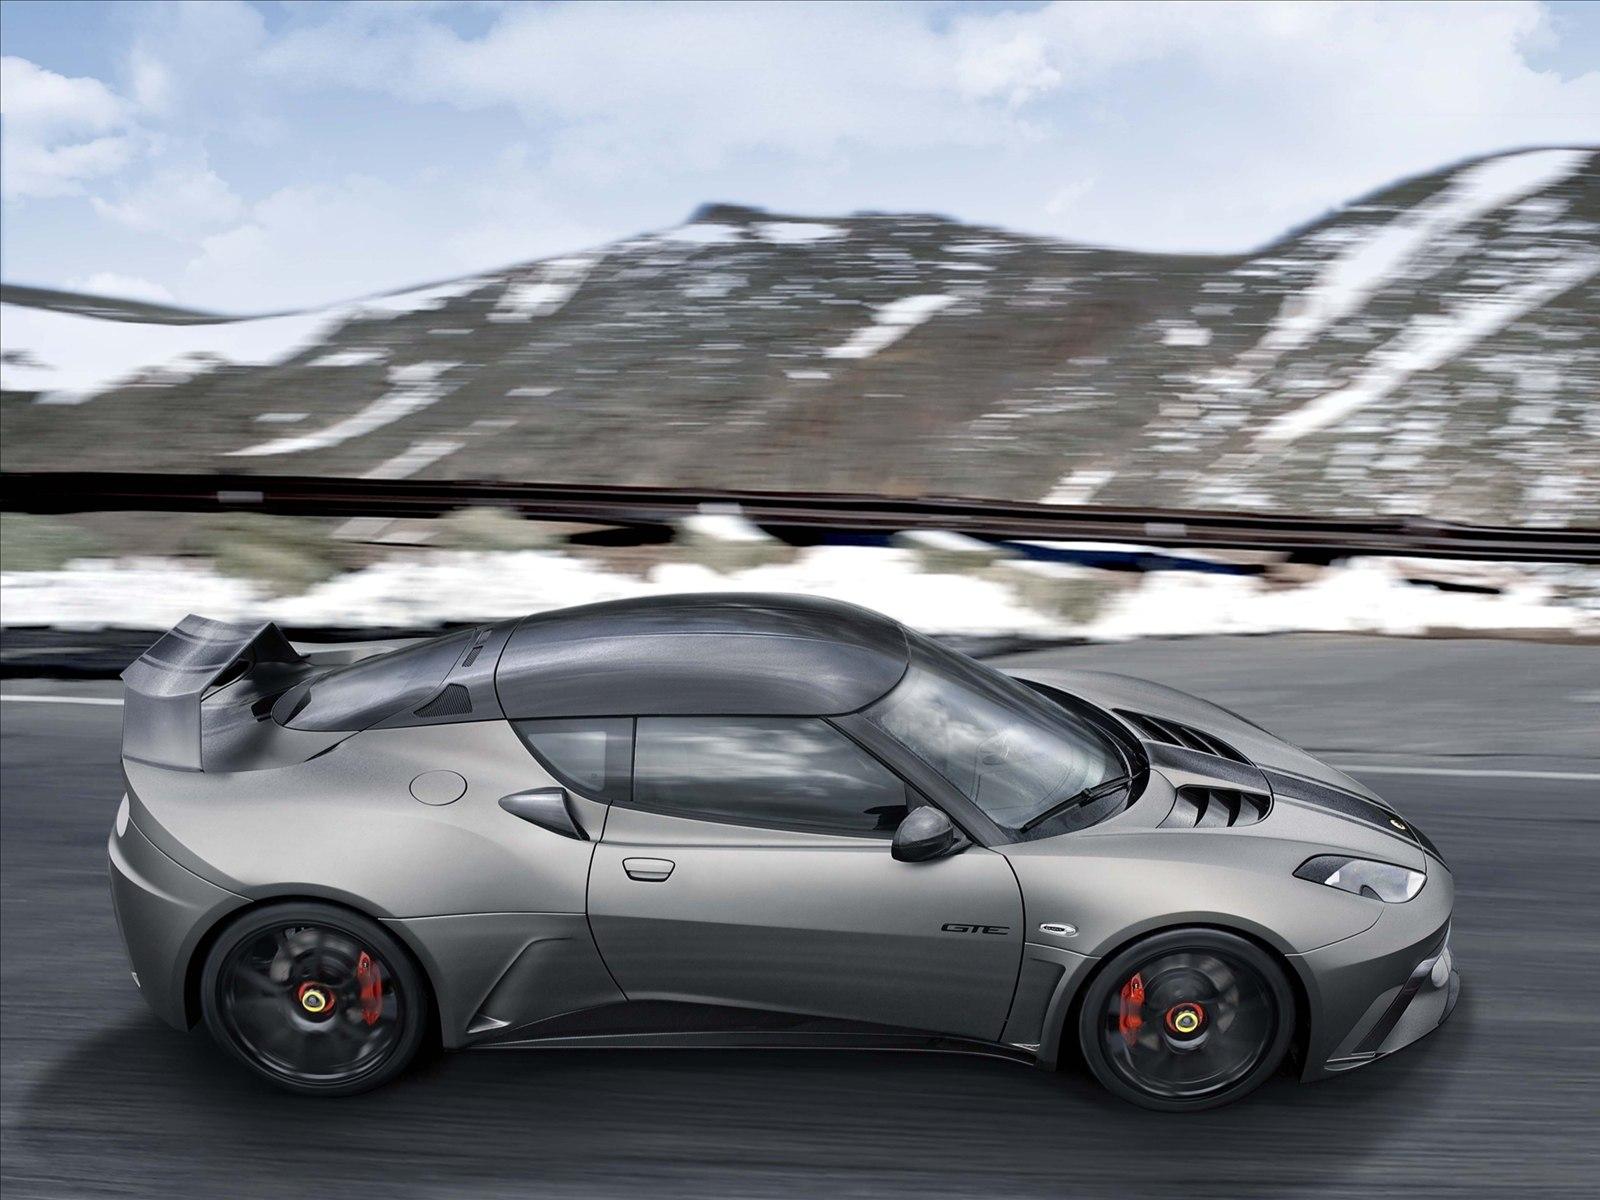 2011 Lotus Evora GTE Road Car Concept